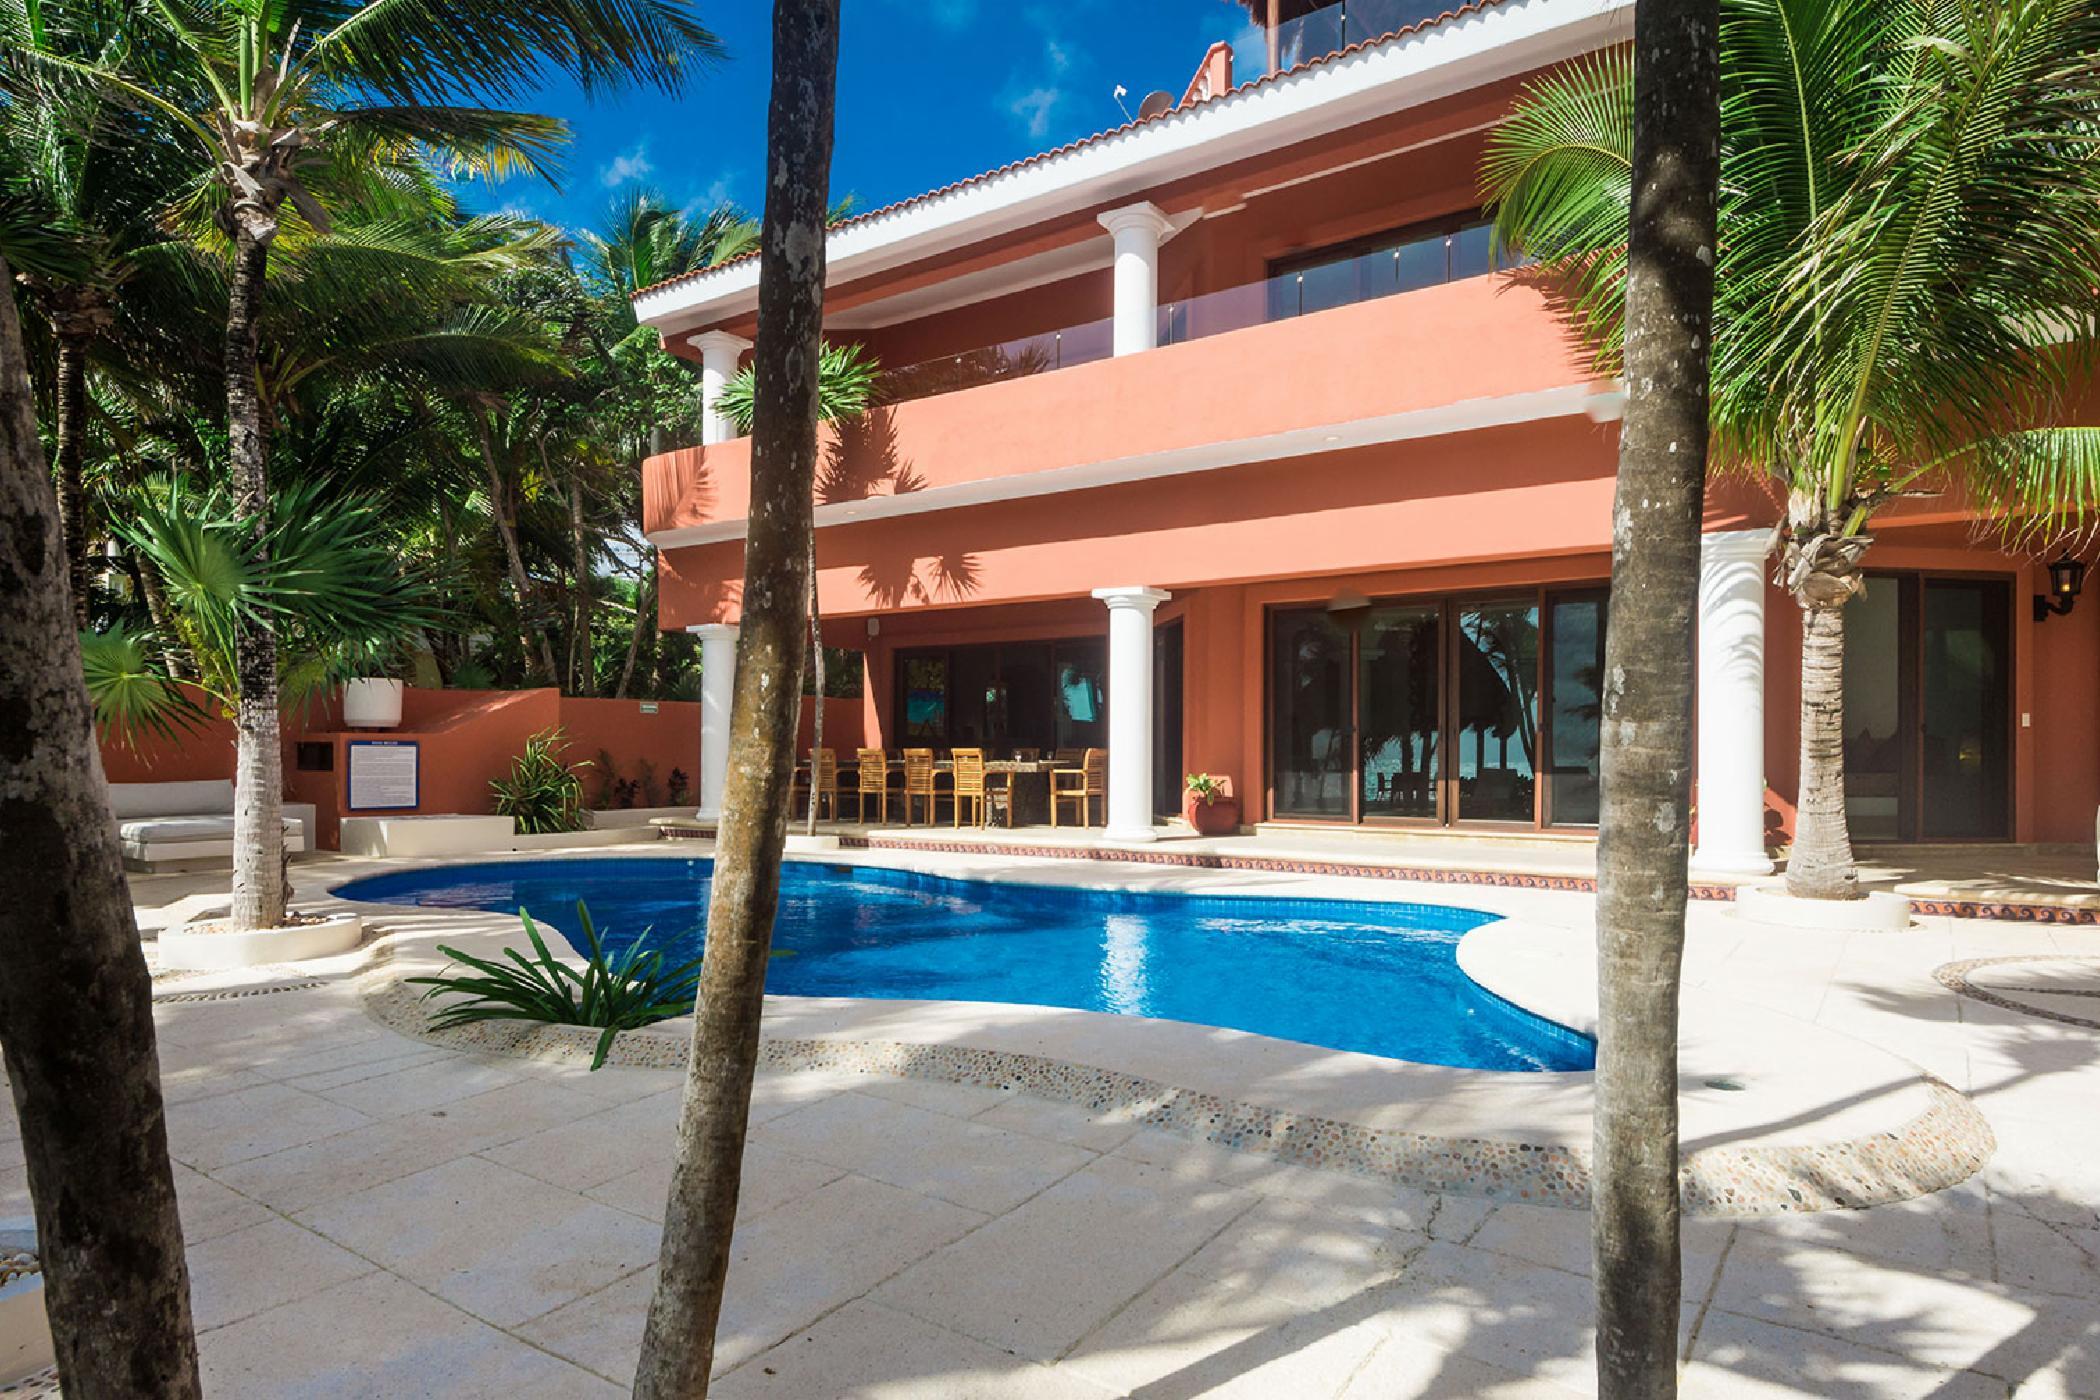 Agents_Maya_Luxe_Riviera_Maya_Luxury_Villas_Casa_Yardena8.jpg